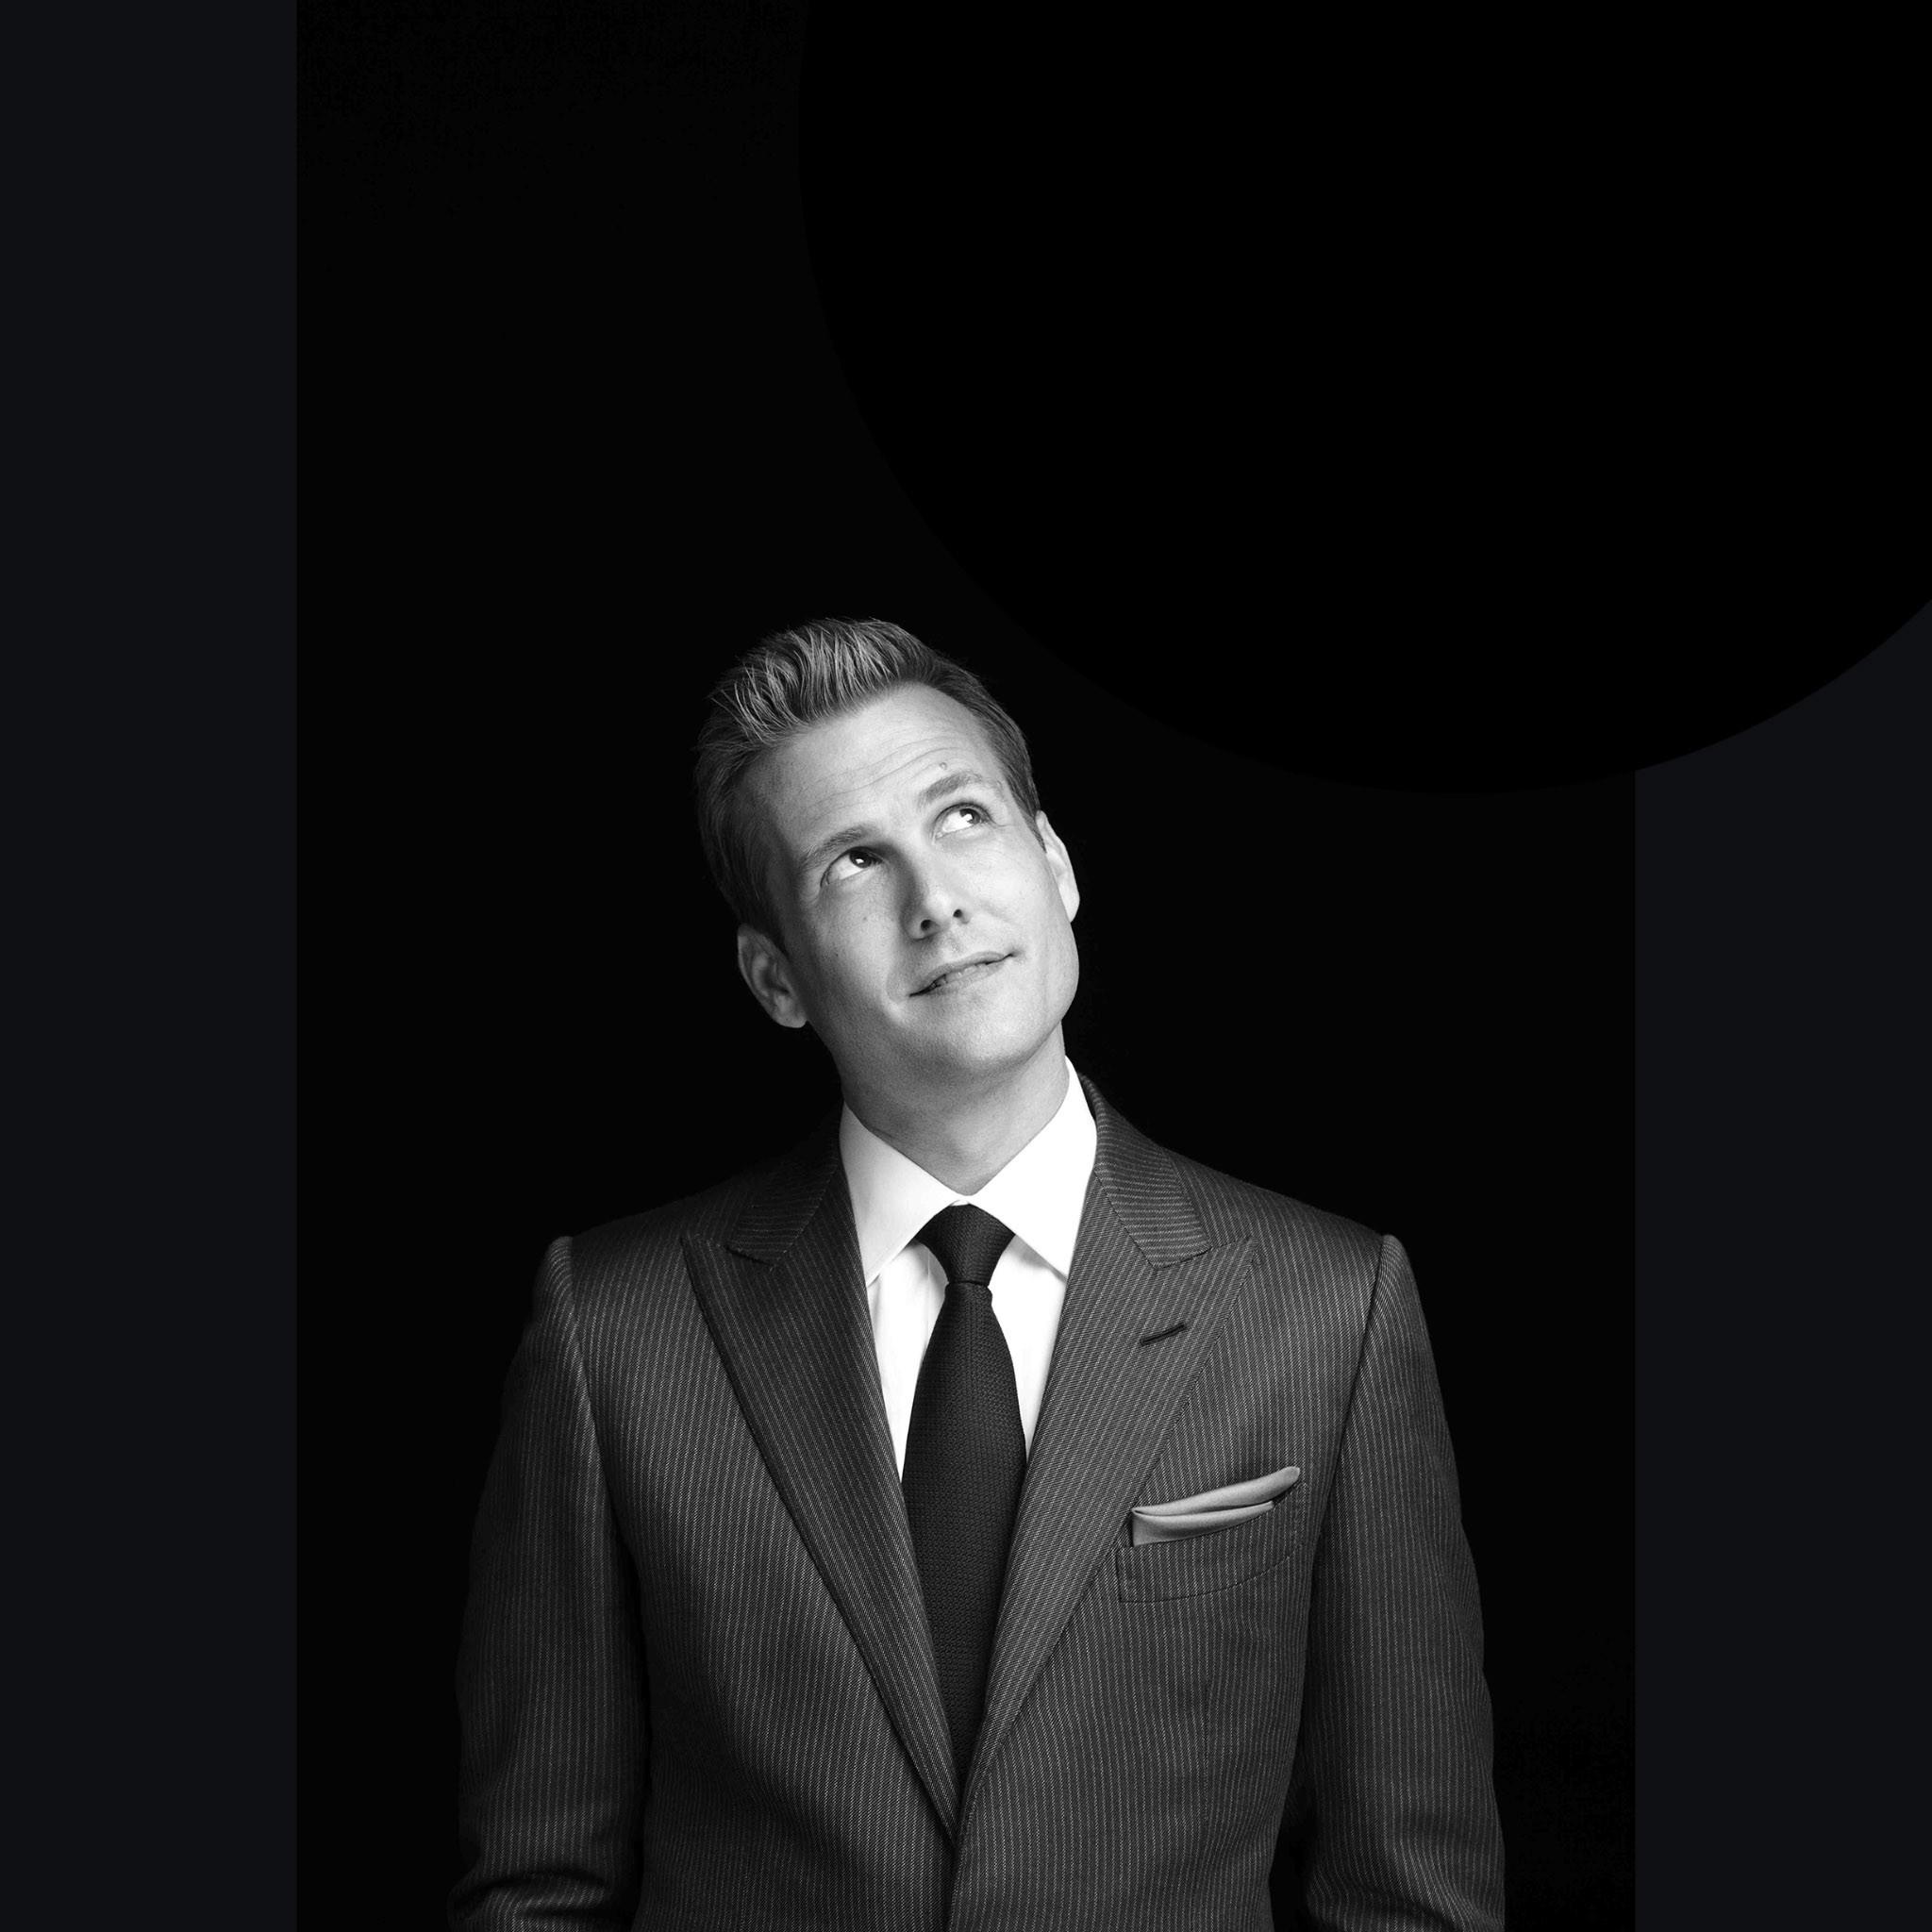 Harvey Specter Wallpaper 78 Images